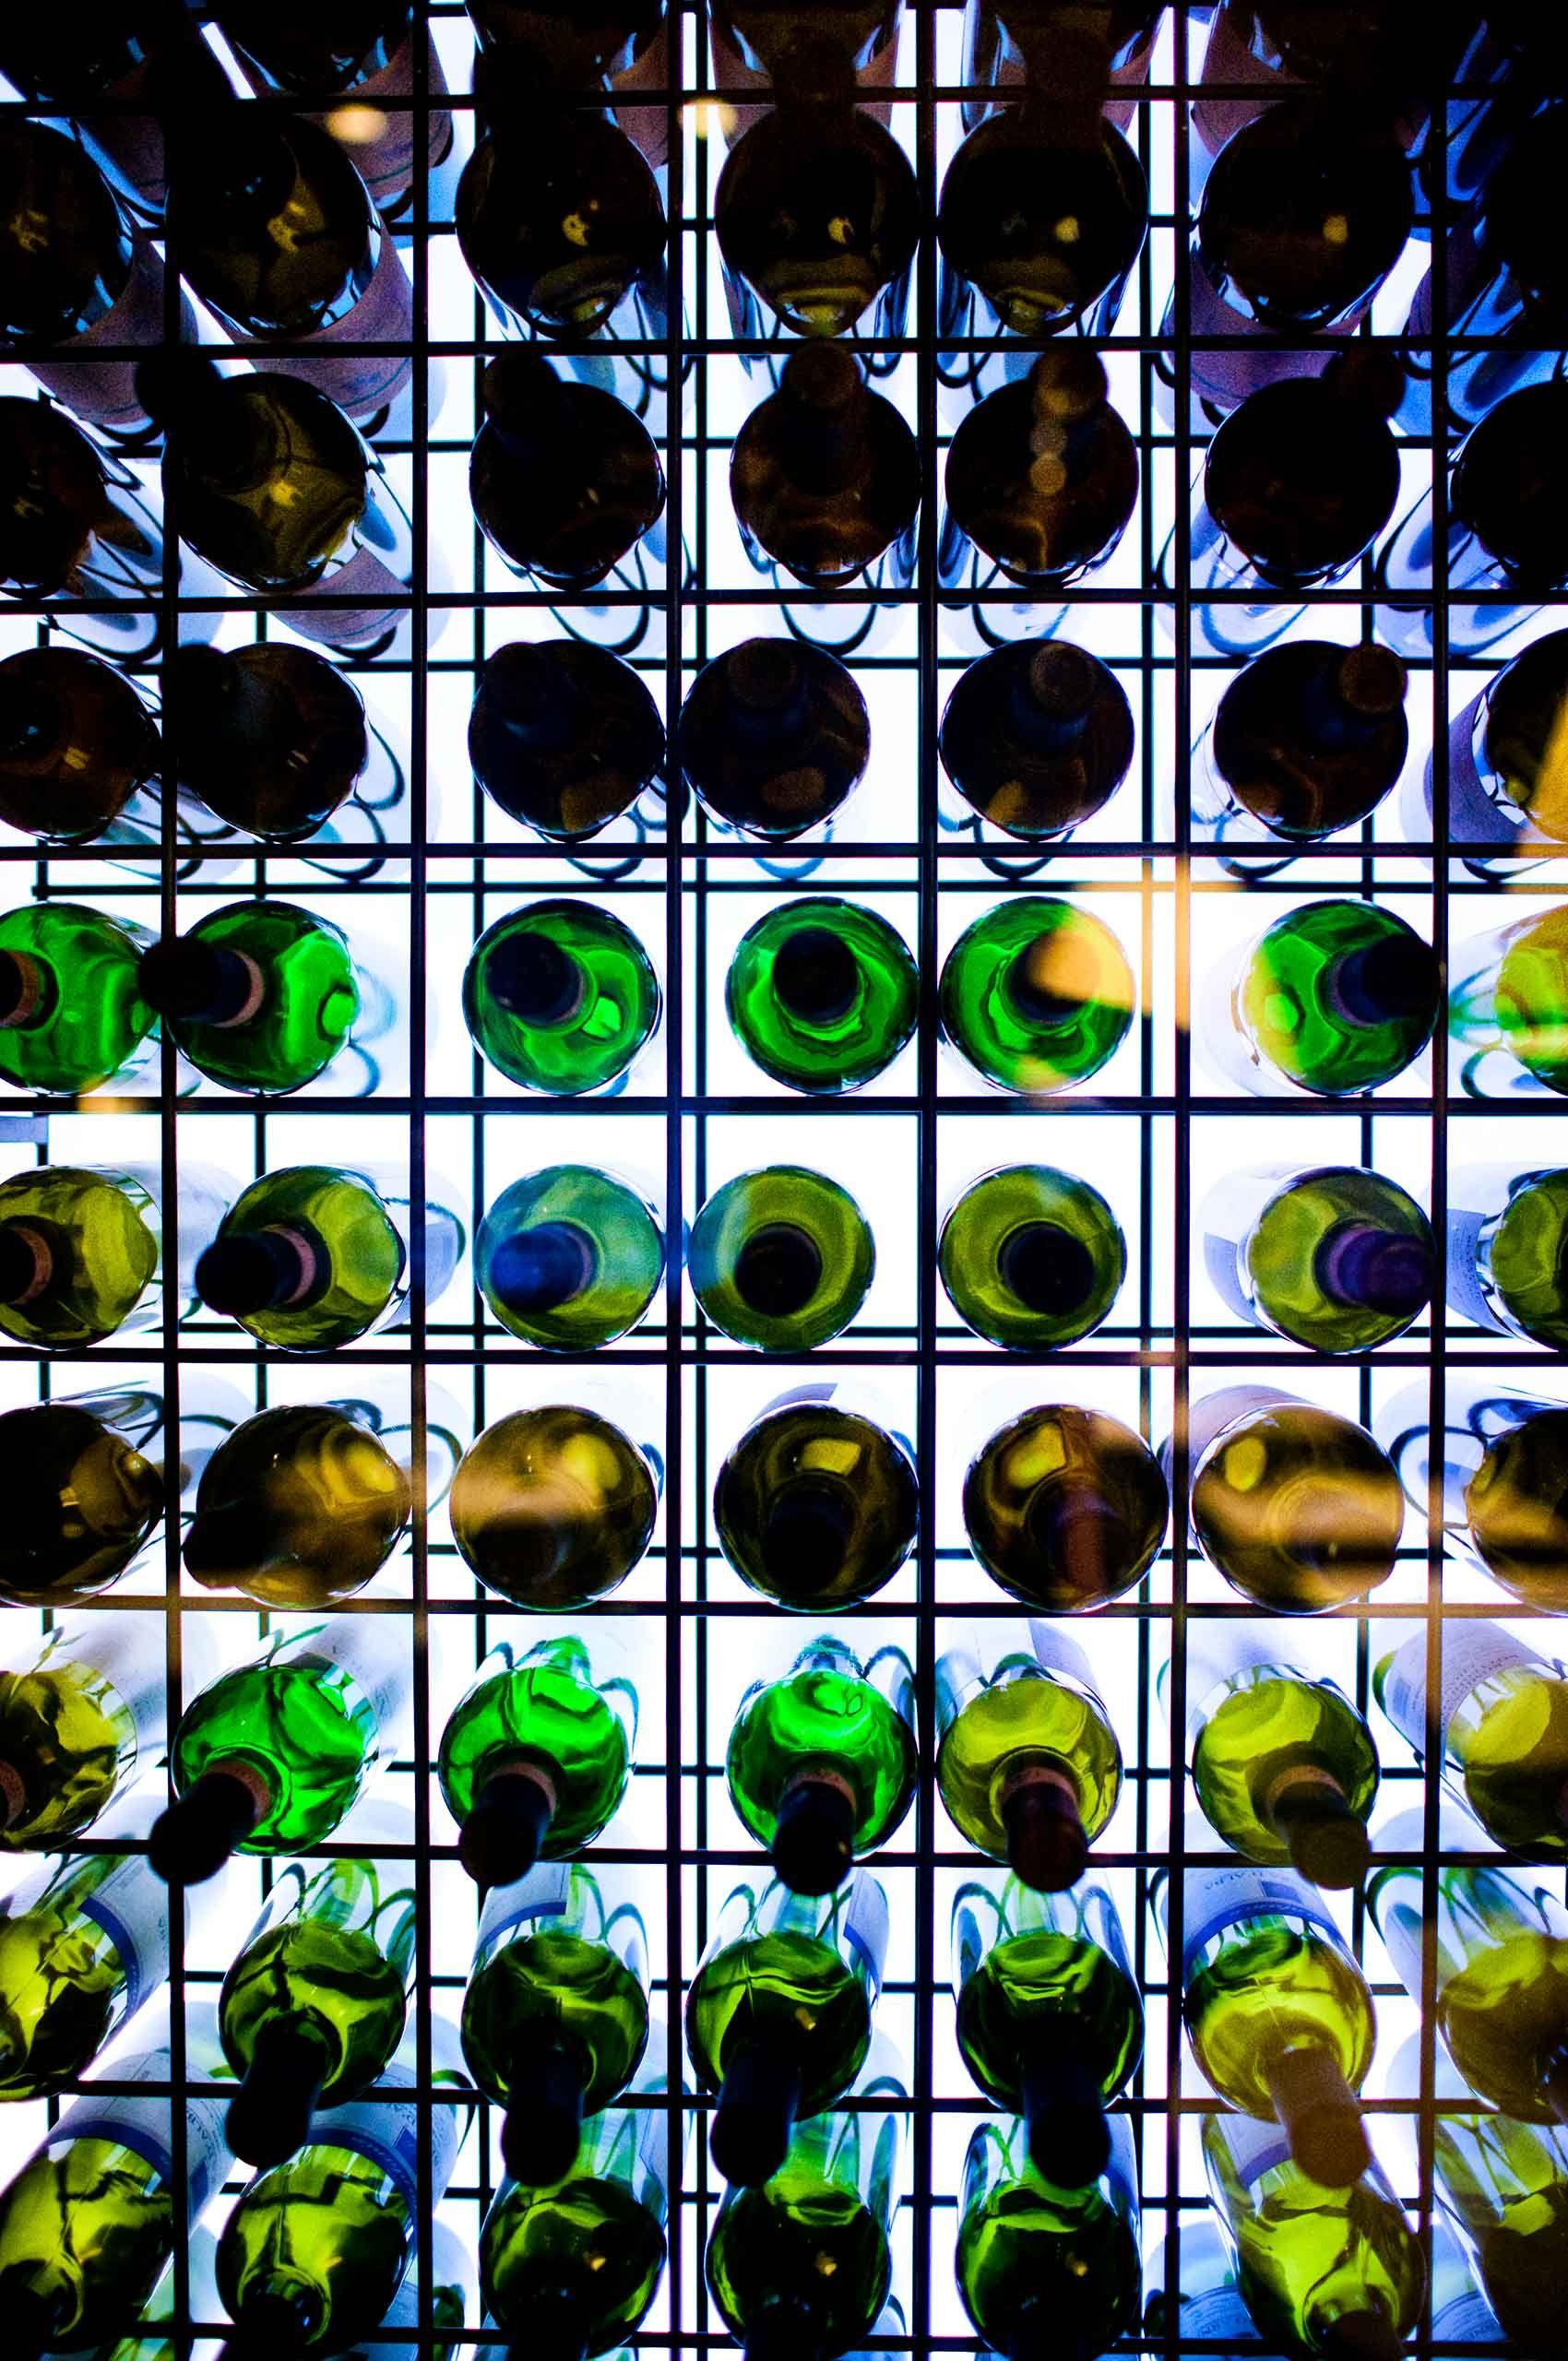 Winecellar-HenrikOlundPhotography.jpg